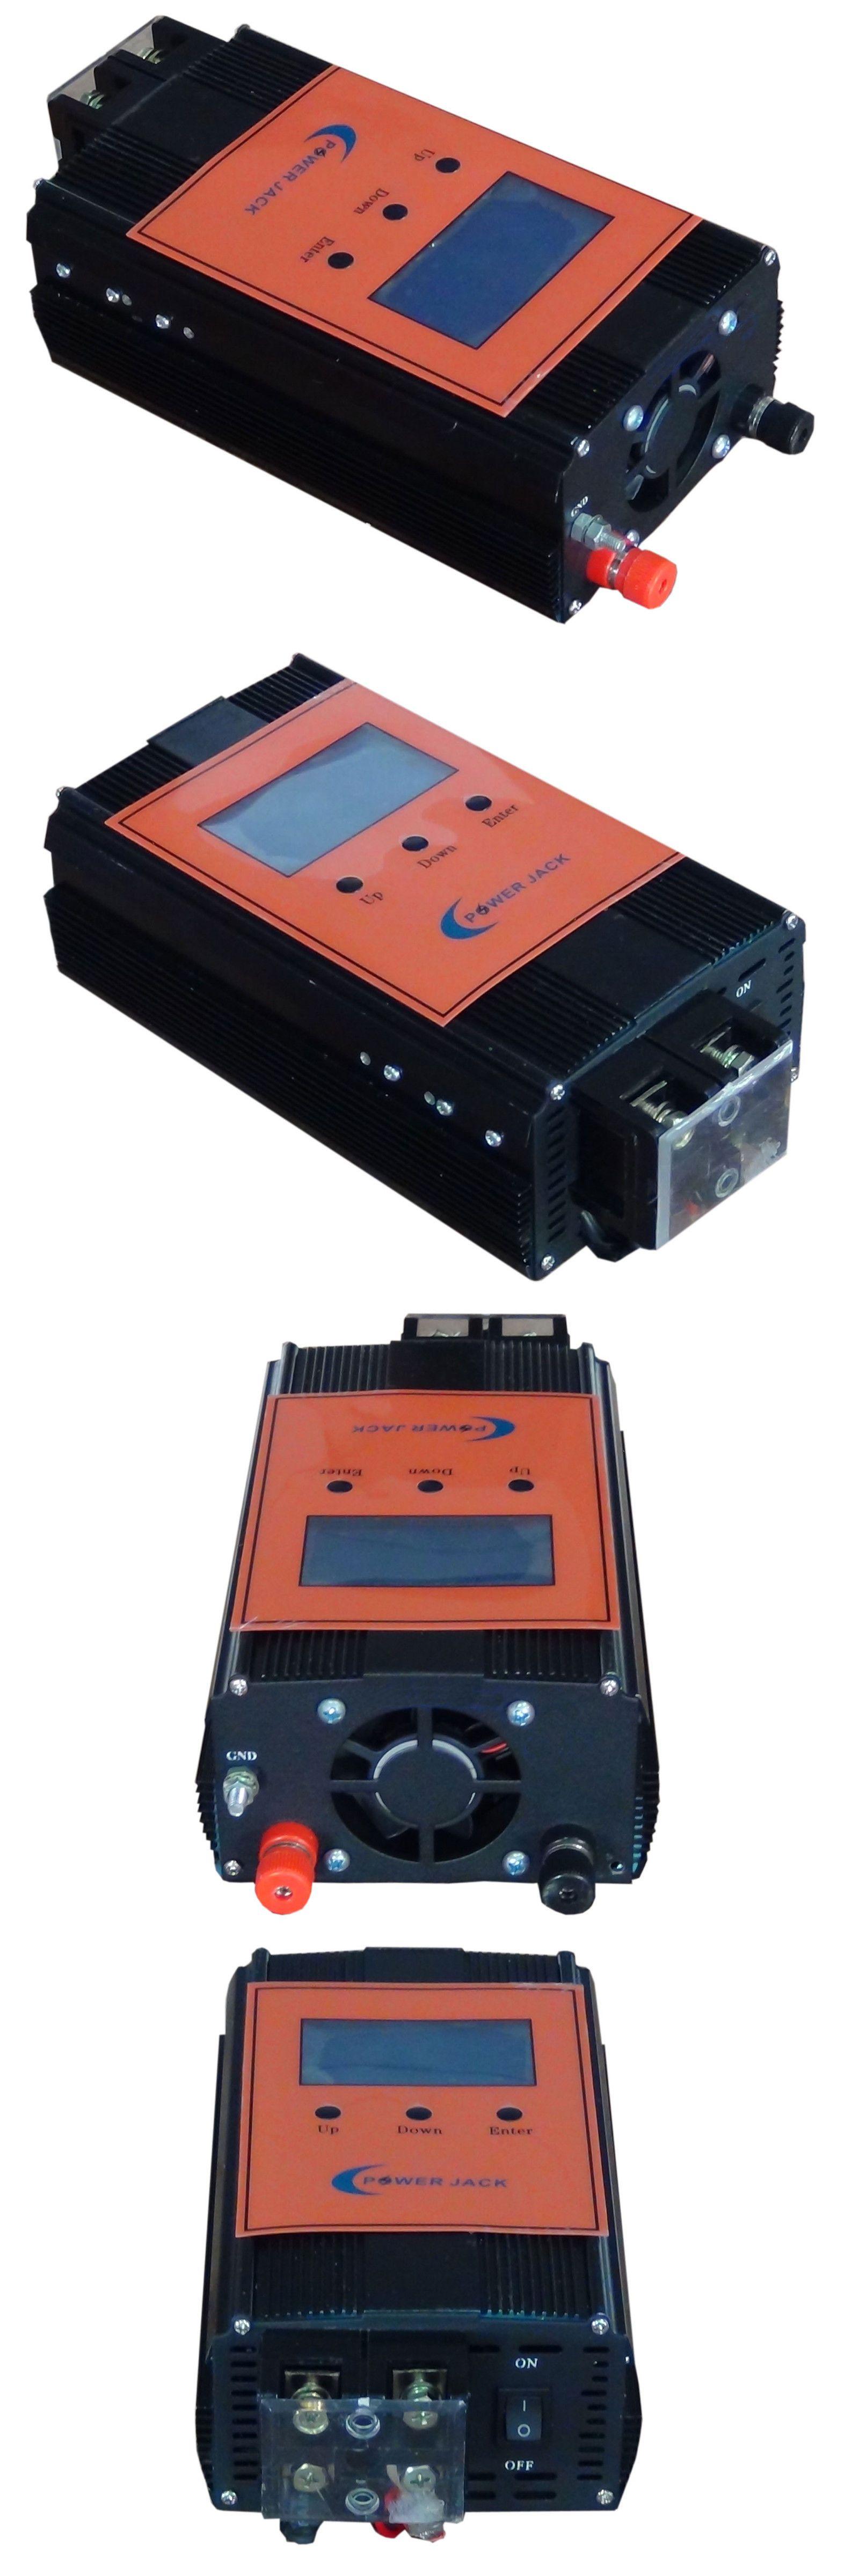 Details About 2400w Smart Solar Controller Dc12v 24v Mppt 100amp Solar Panel 3 5 Lcd Power Inverters Solar Panels Solar Energy